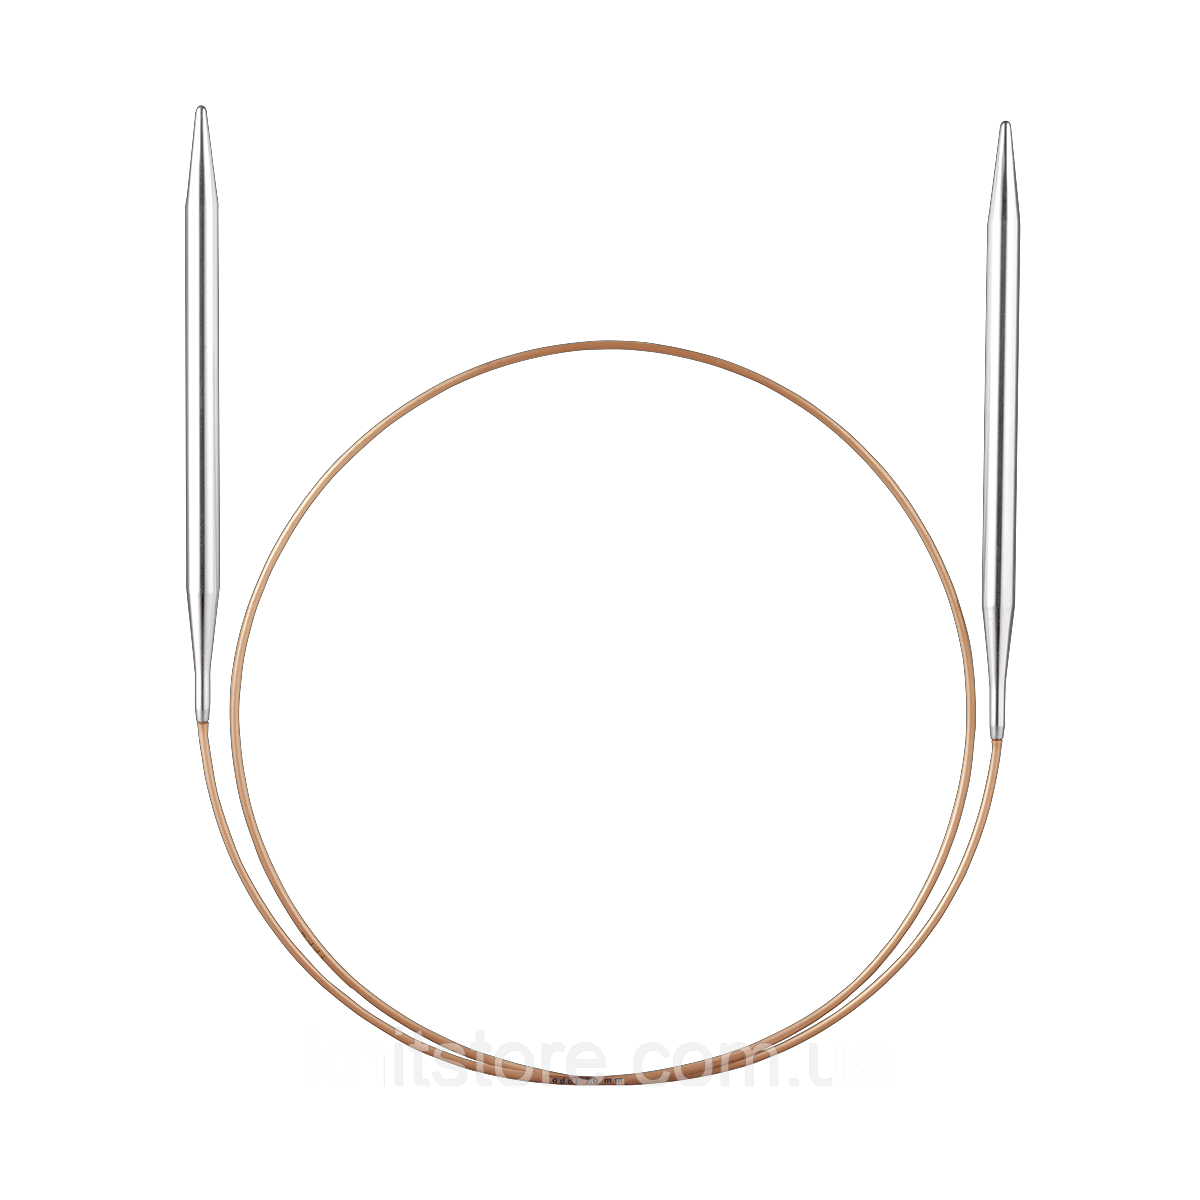 Спицы круговые Addi 100 см | 4.5 мм